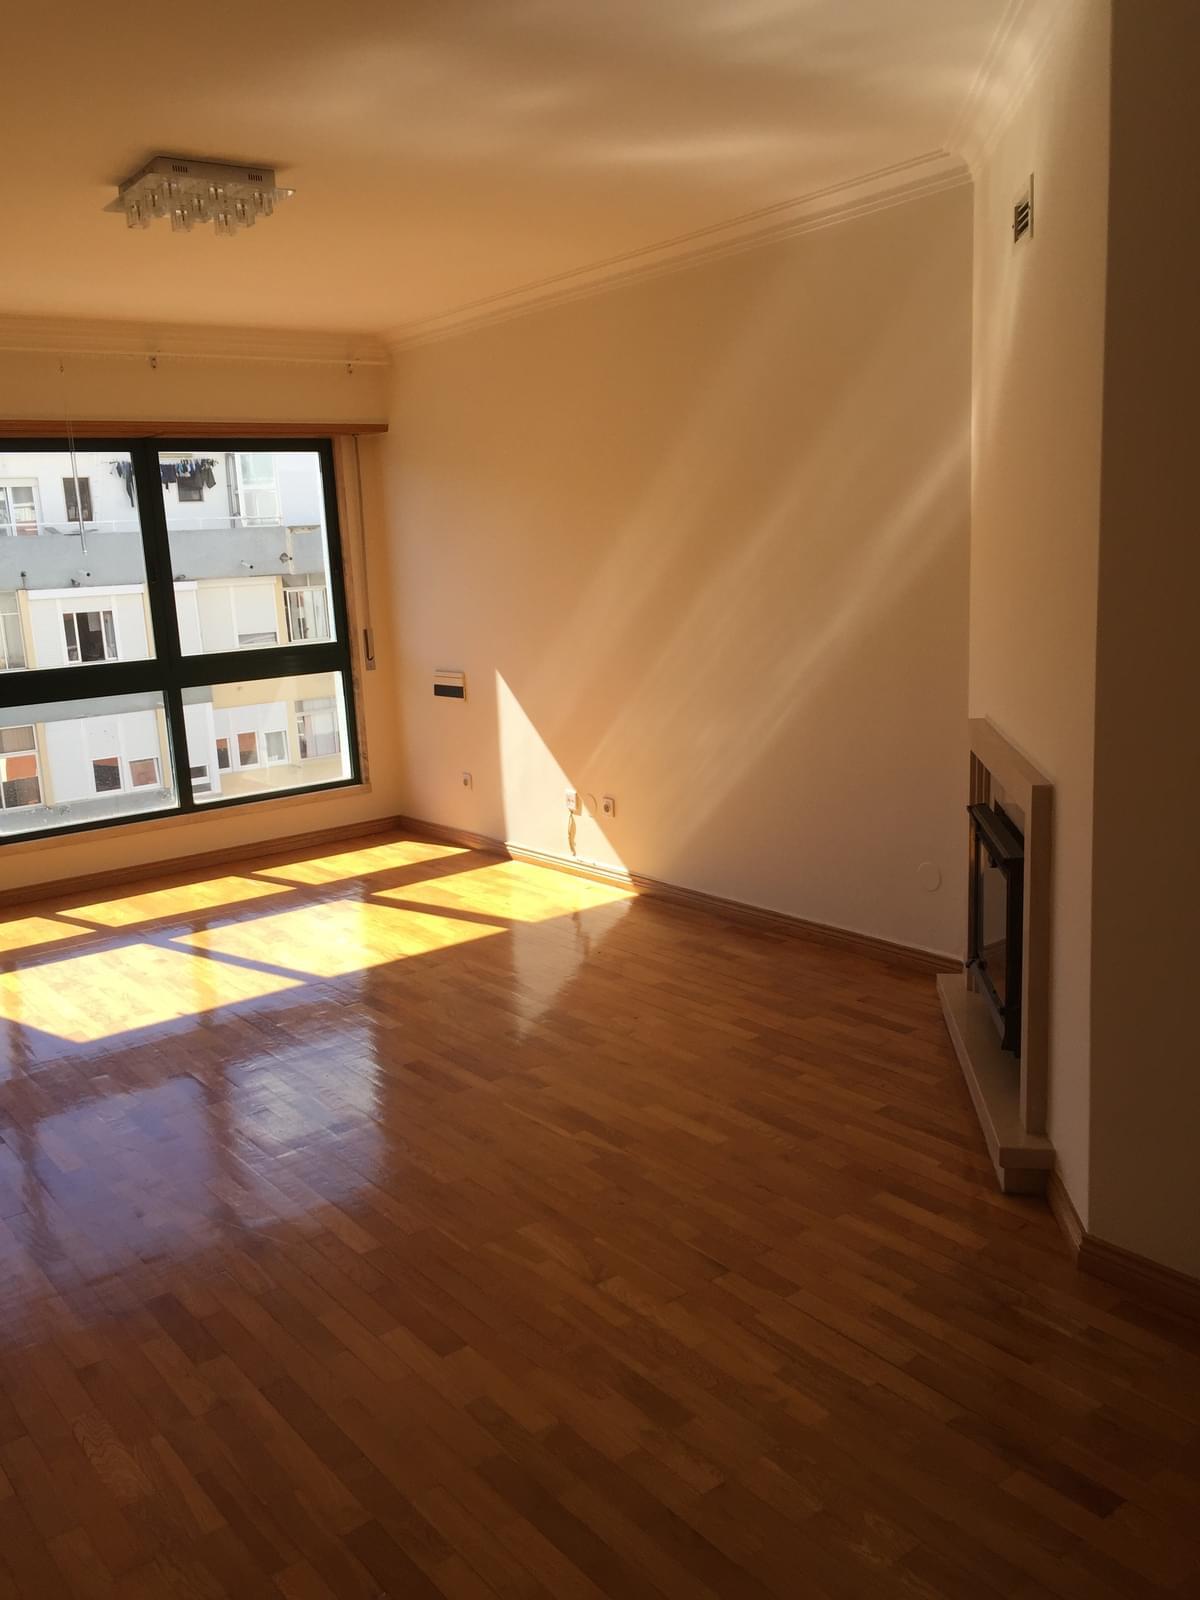 pf18344-apartamento-t3-oeiras-14722a2e-6243-41aa-83e4-7492e3887e4b